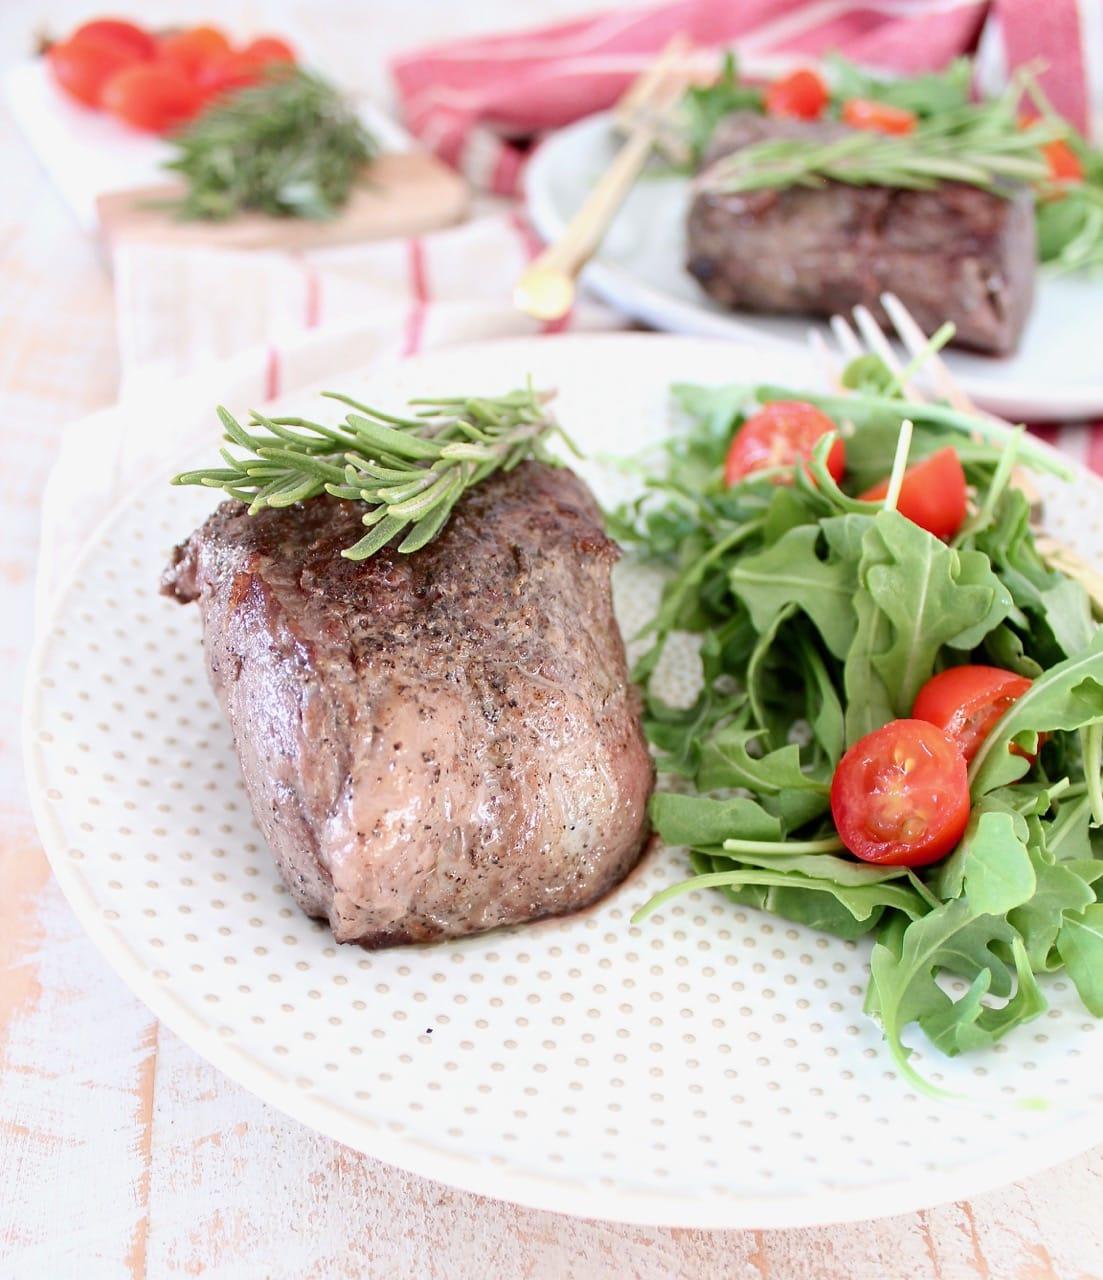 Sous Vide Rosemary Garlic Sirloin Steak with Arugula Tomato Side Salad